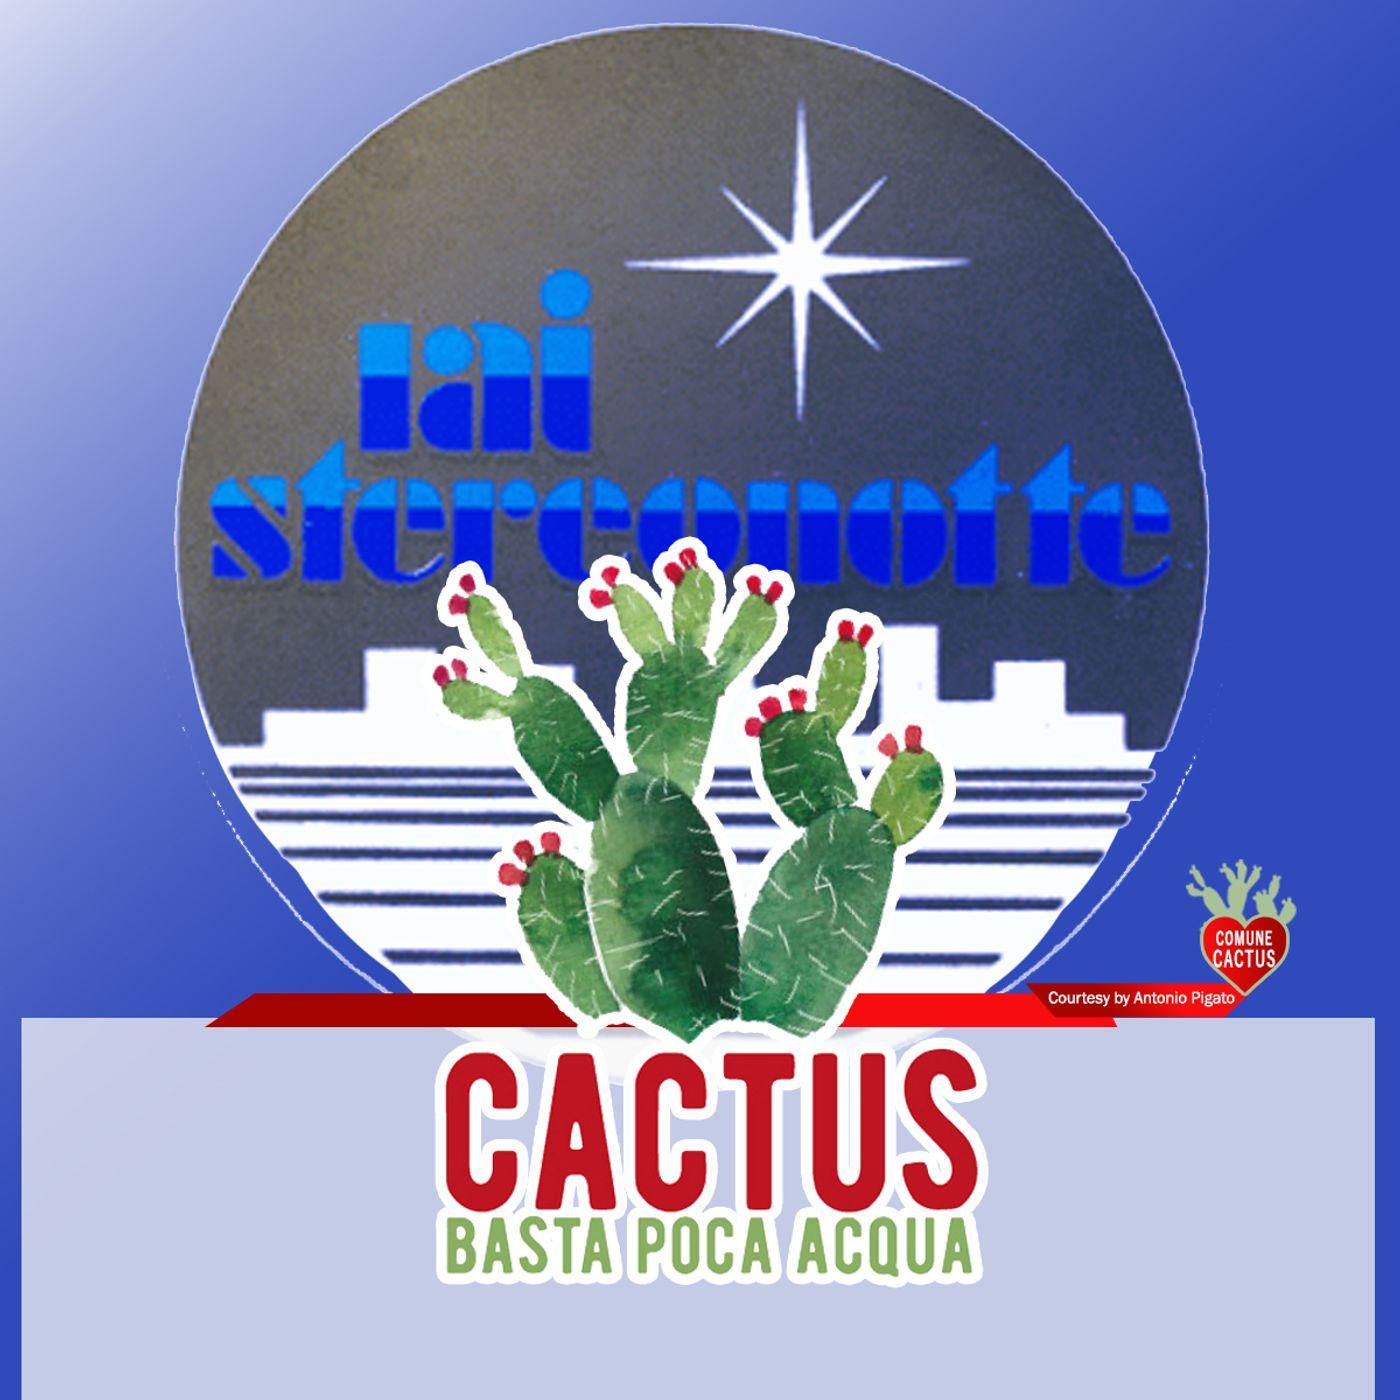 Cactus #24 - Nella notte - 11/03/2021